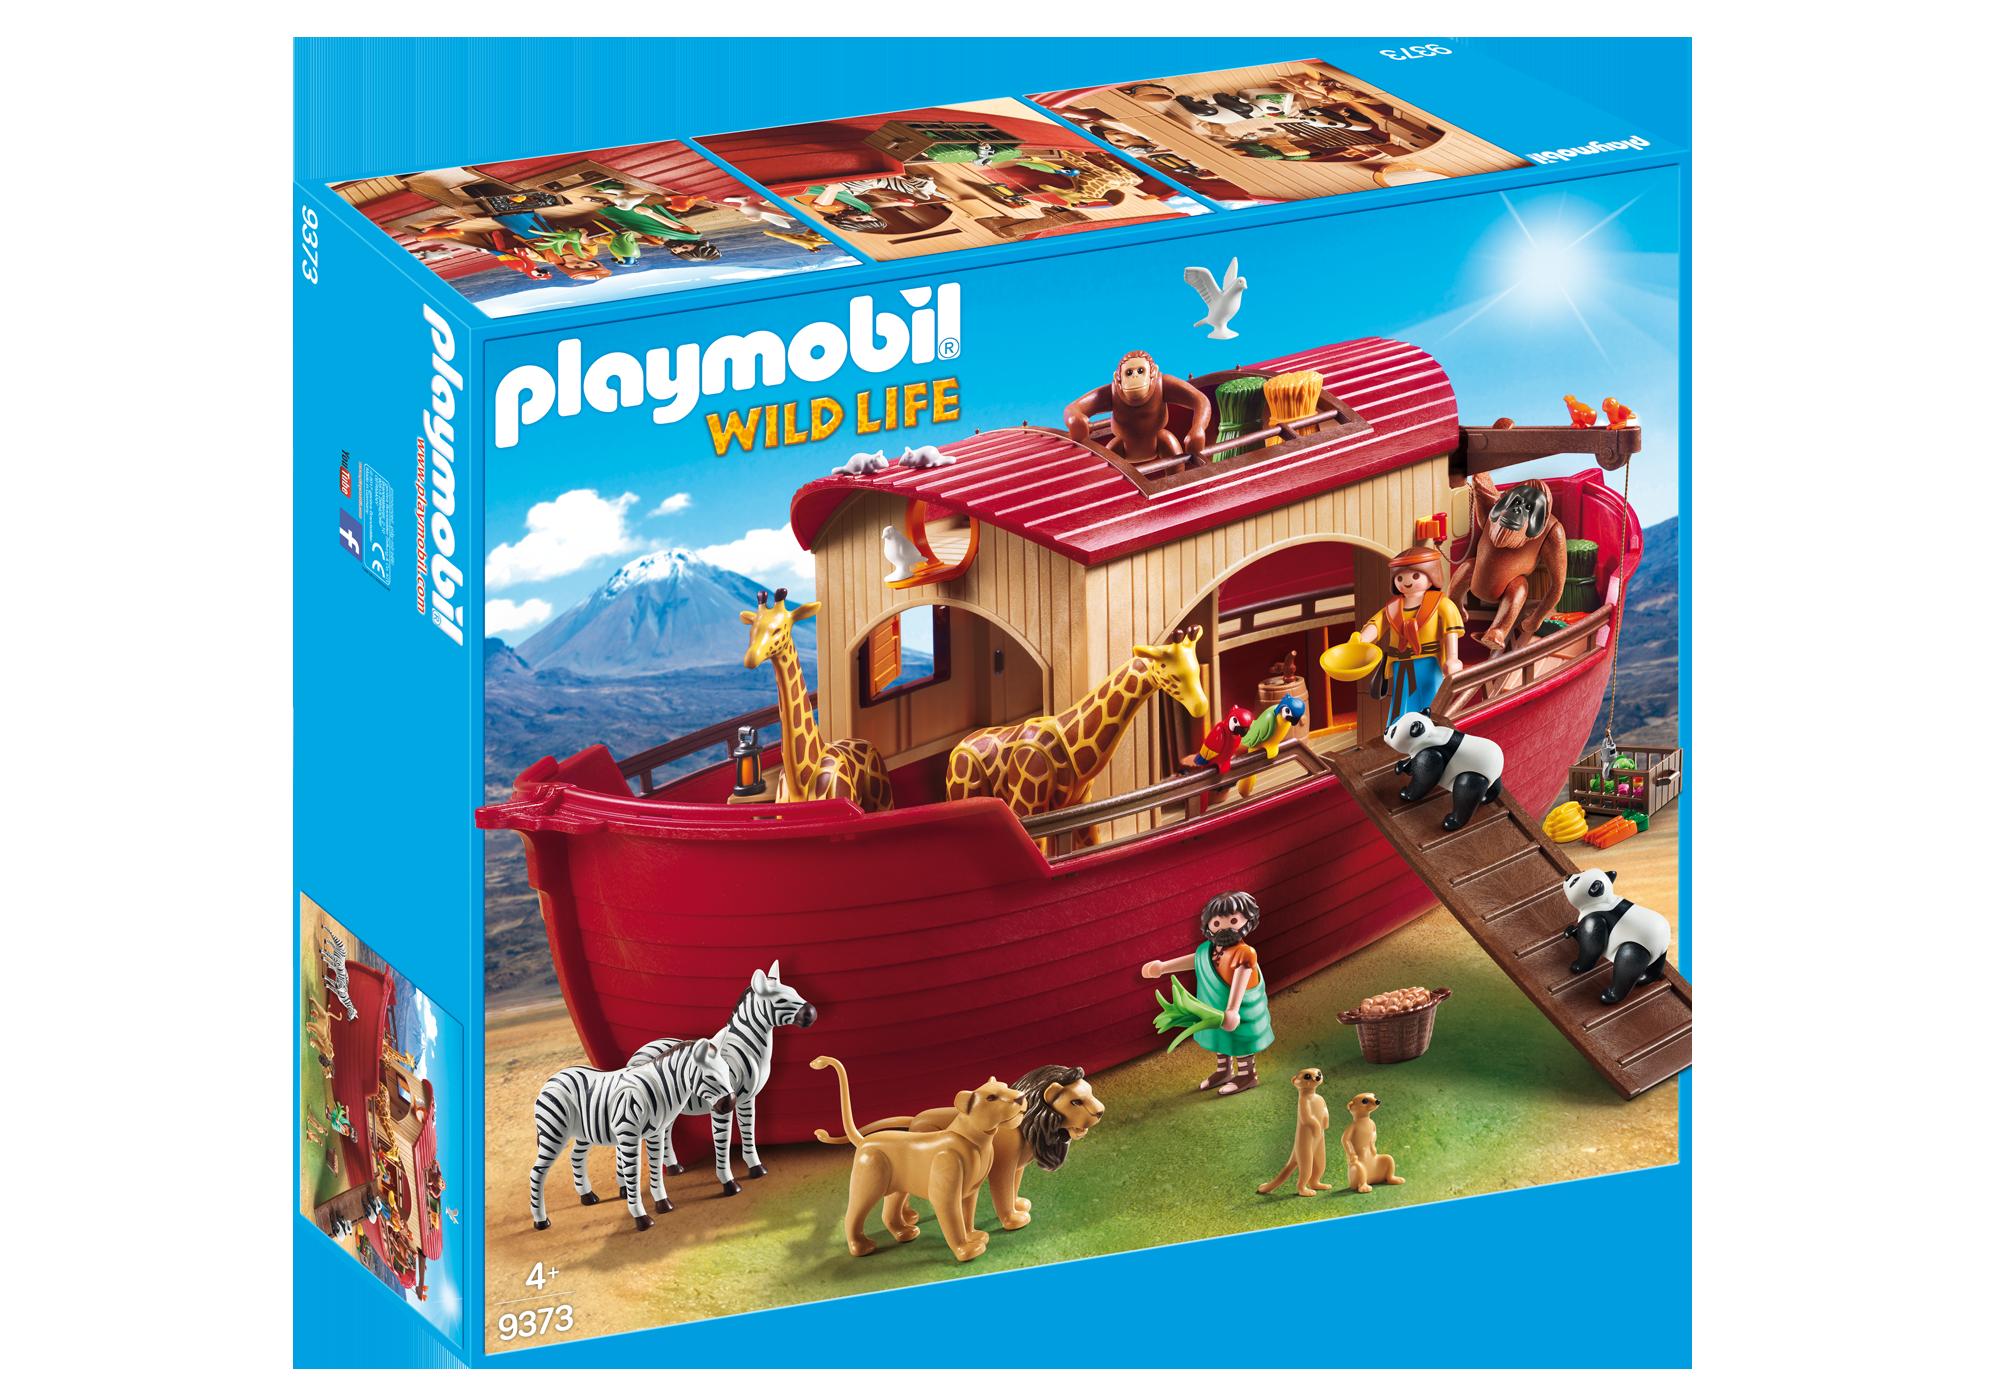 http://media.playmobil.com/i/playmobil/9373_product_box_front